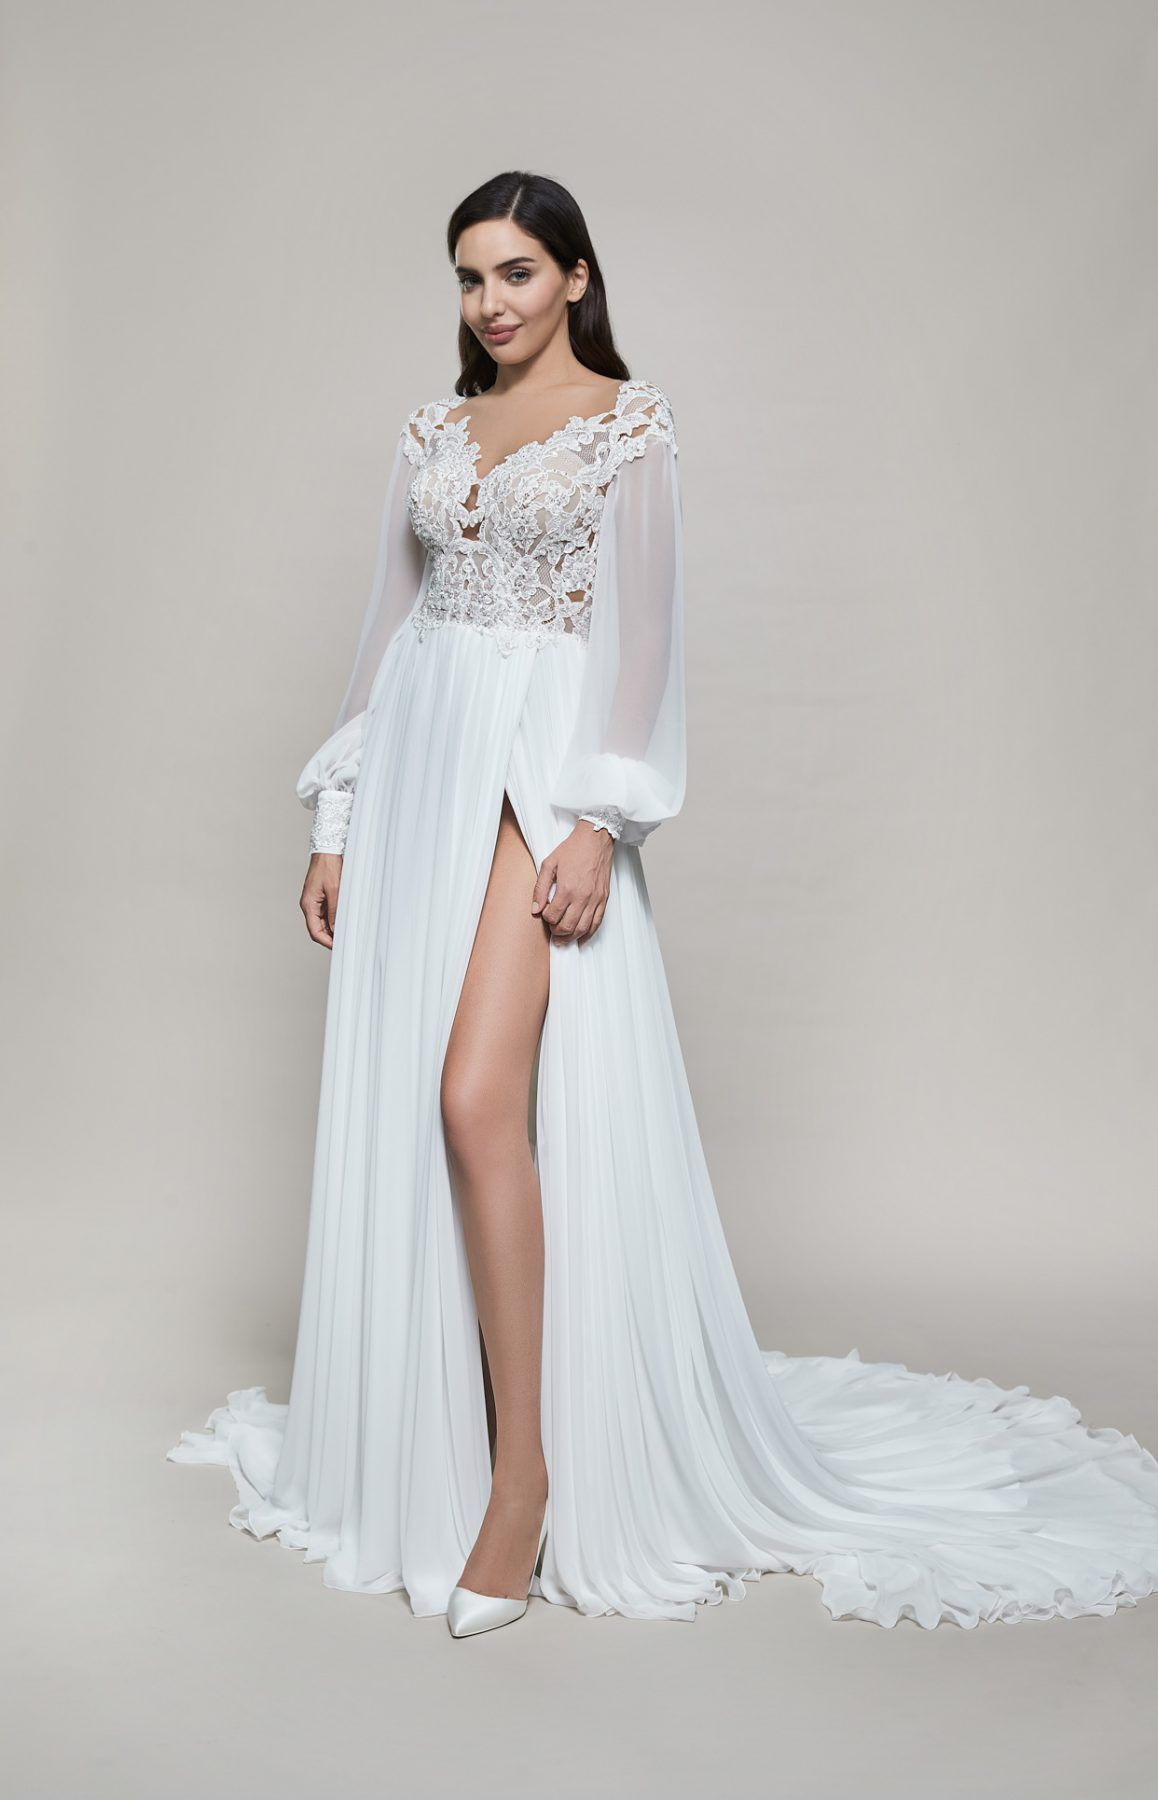 https://www.kleinfeldbridal.com/wp-content/uploads/2020/11/maison-signore-long-sleeve-v-neckline-a-line-wedding-dress-with-slit-34284240-1-1158x1800.jpg